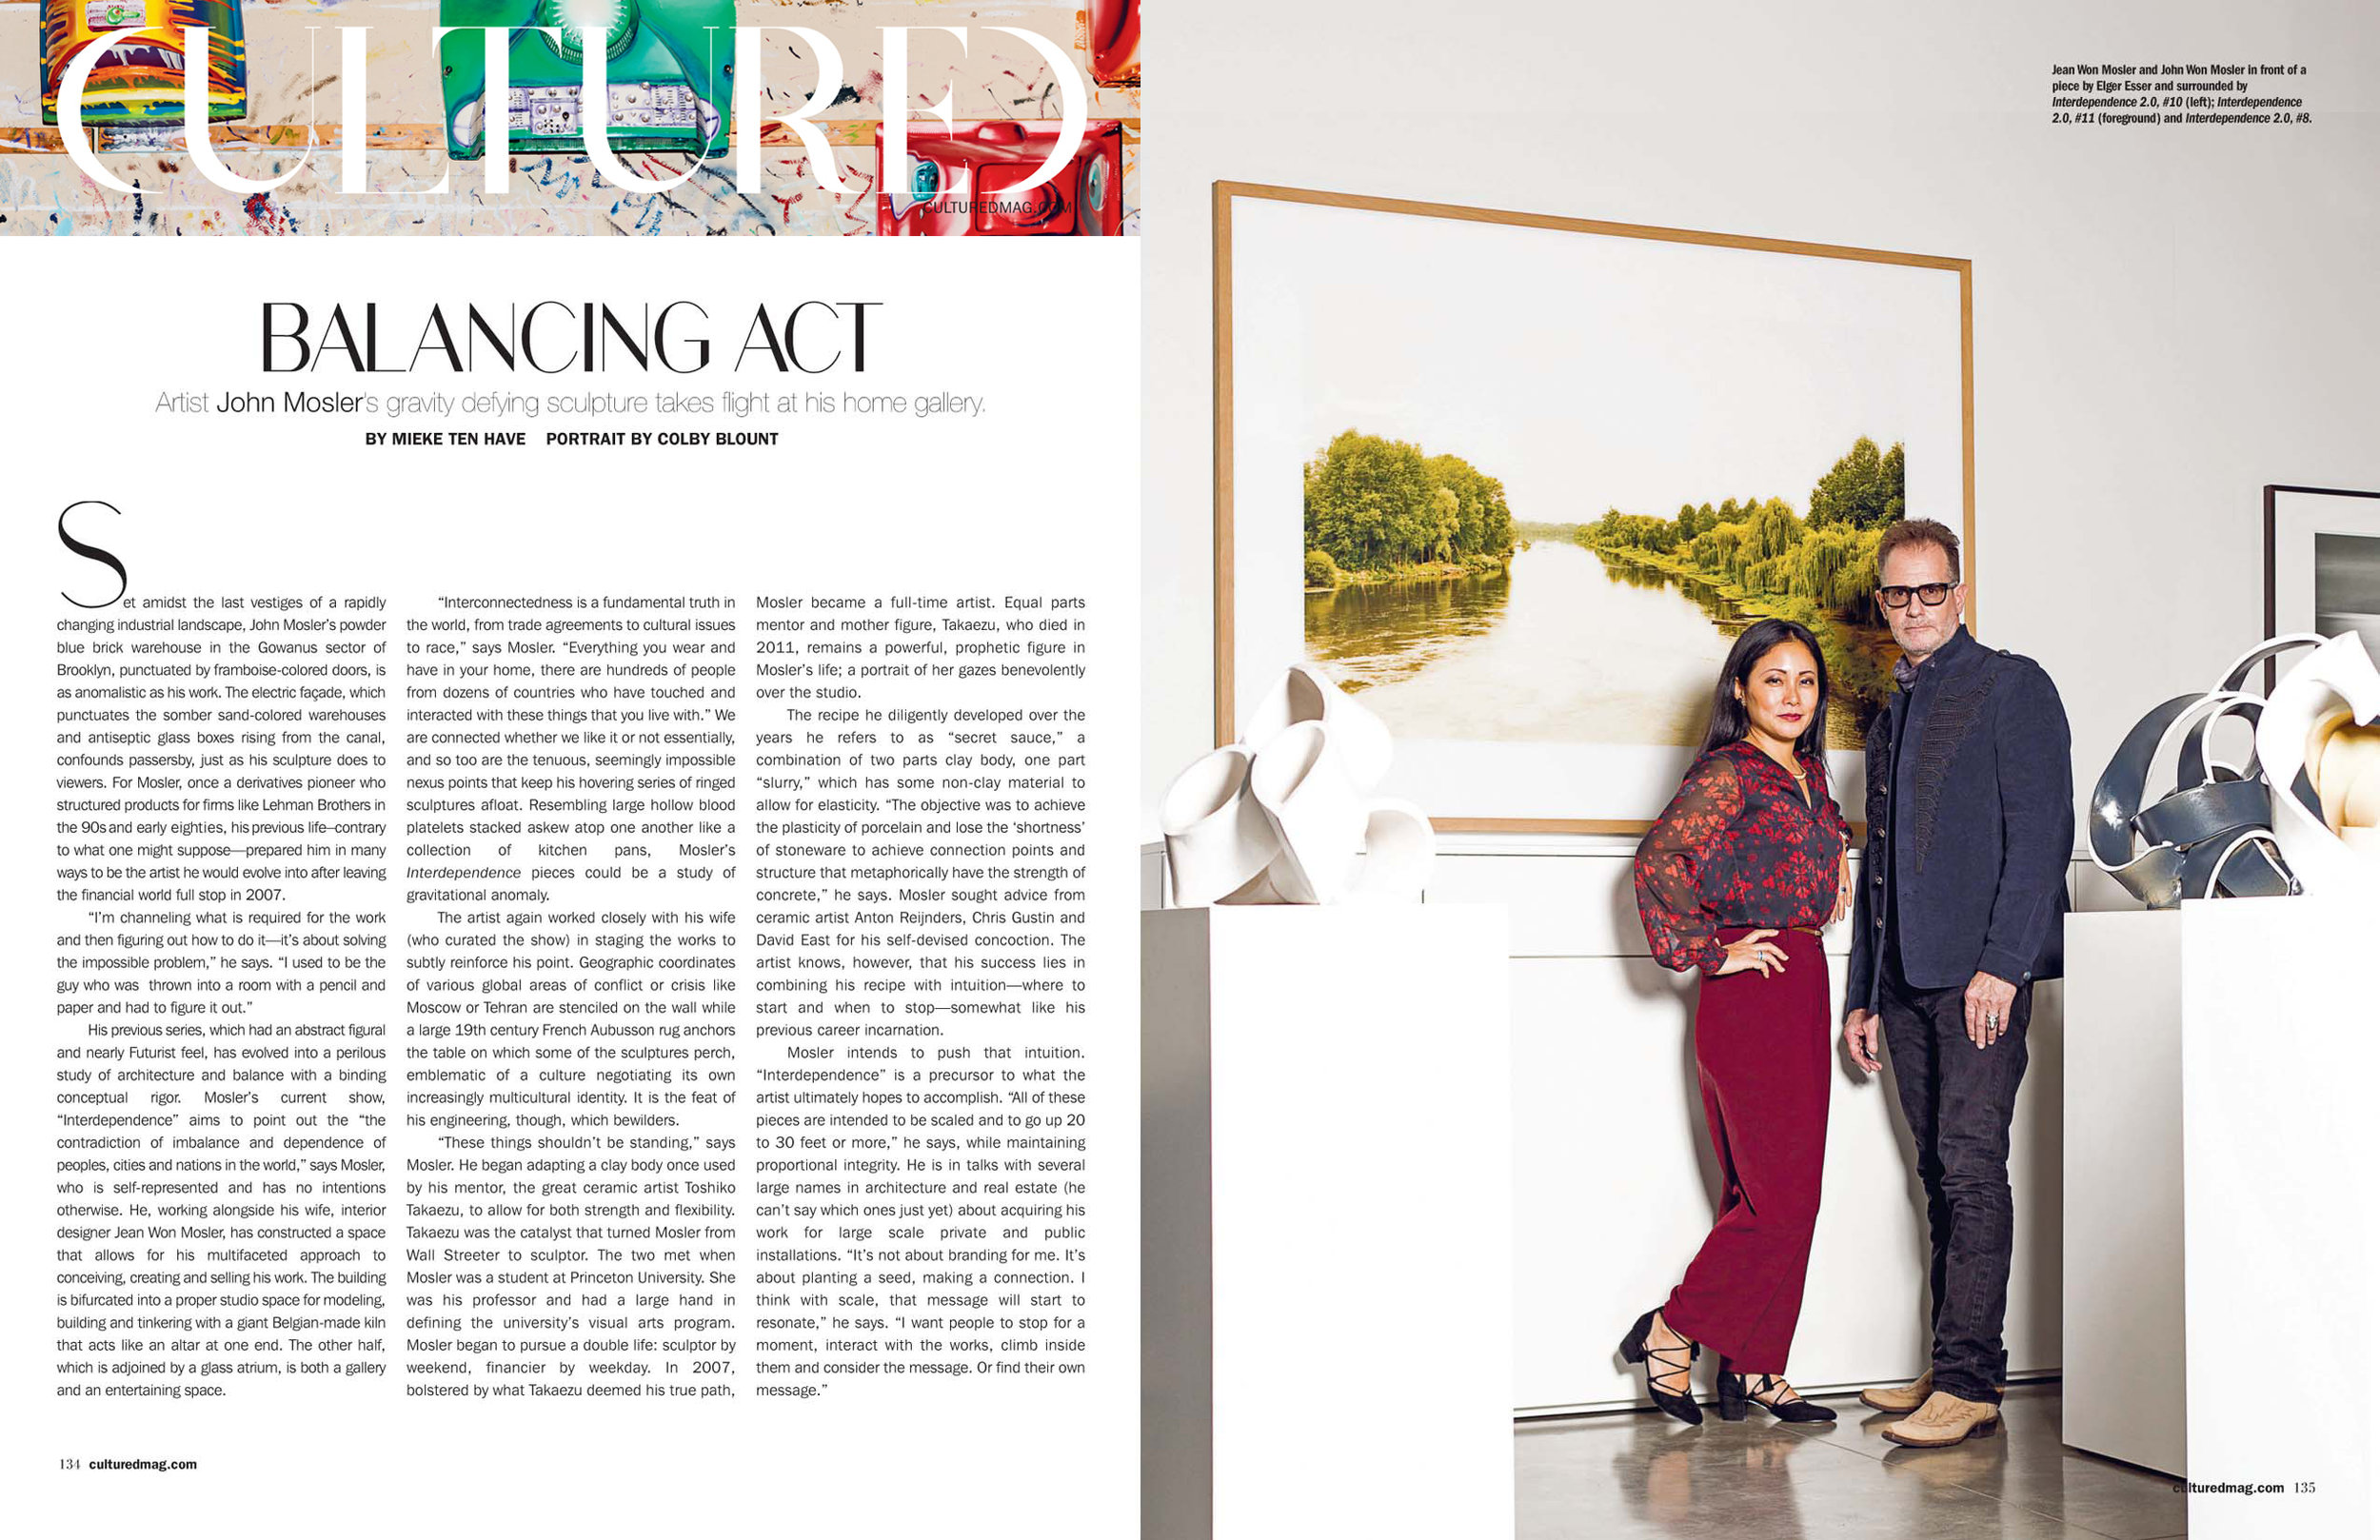 Cultured+Magazine+_+John+Mosler+Balancing+Act+b.jpg